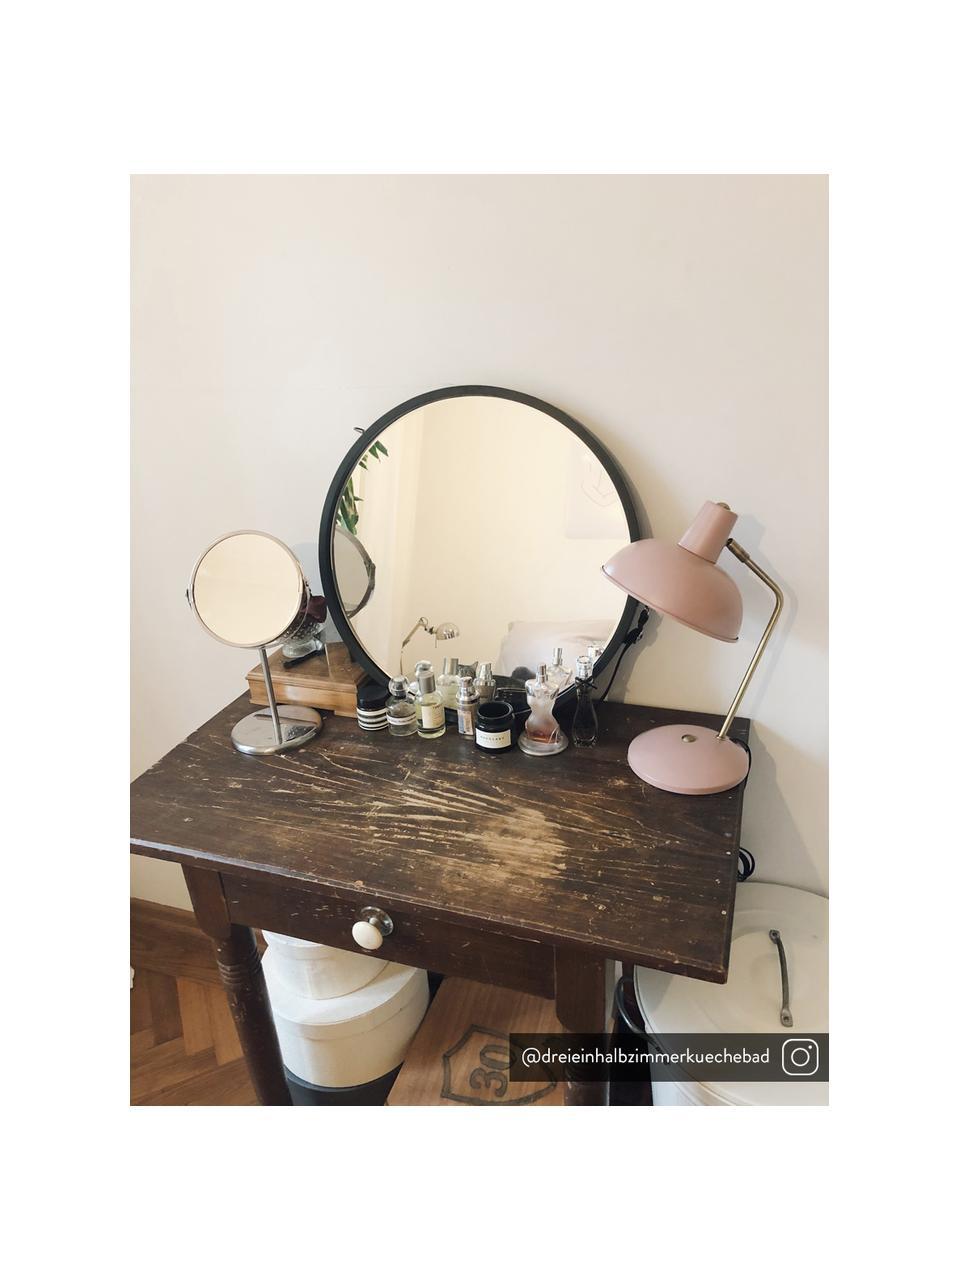 Retro-Schreibtischlampe Hood, Lampenschirm: Metall, lackiert, Lampenfuß: Metall, lackiert, Leuchte: Rosa, Messingfarben Lampenschirm innen: Weiß, 20 x 38 cm